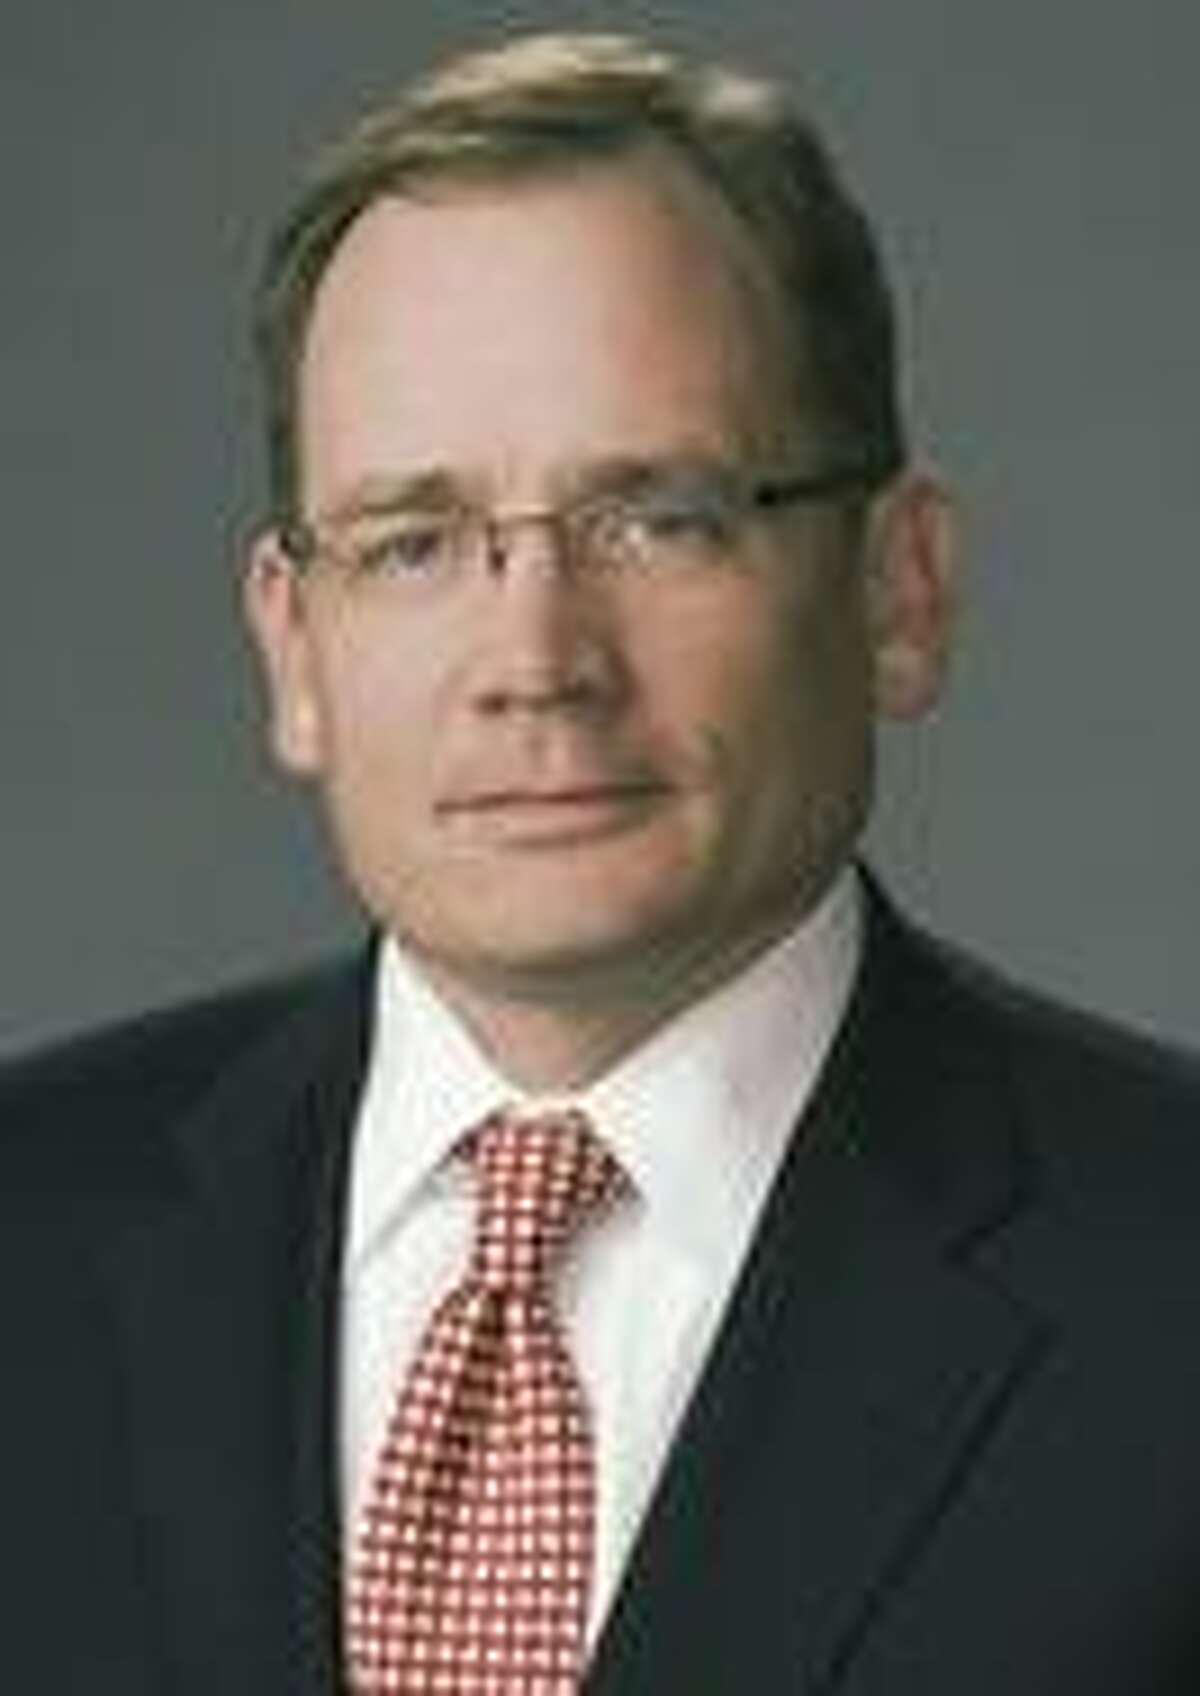 Latham & Watkins partner Sean Wheeler is moving his highly successful legal practice to Kirkland & Ellis in Houston.